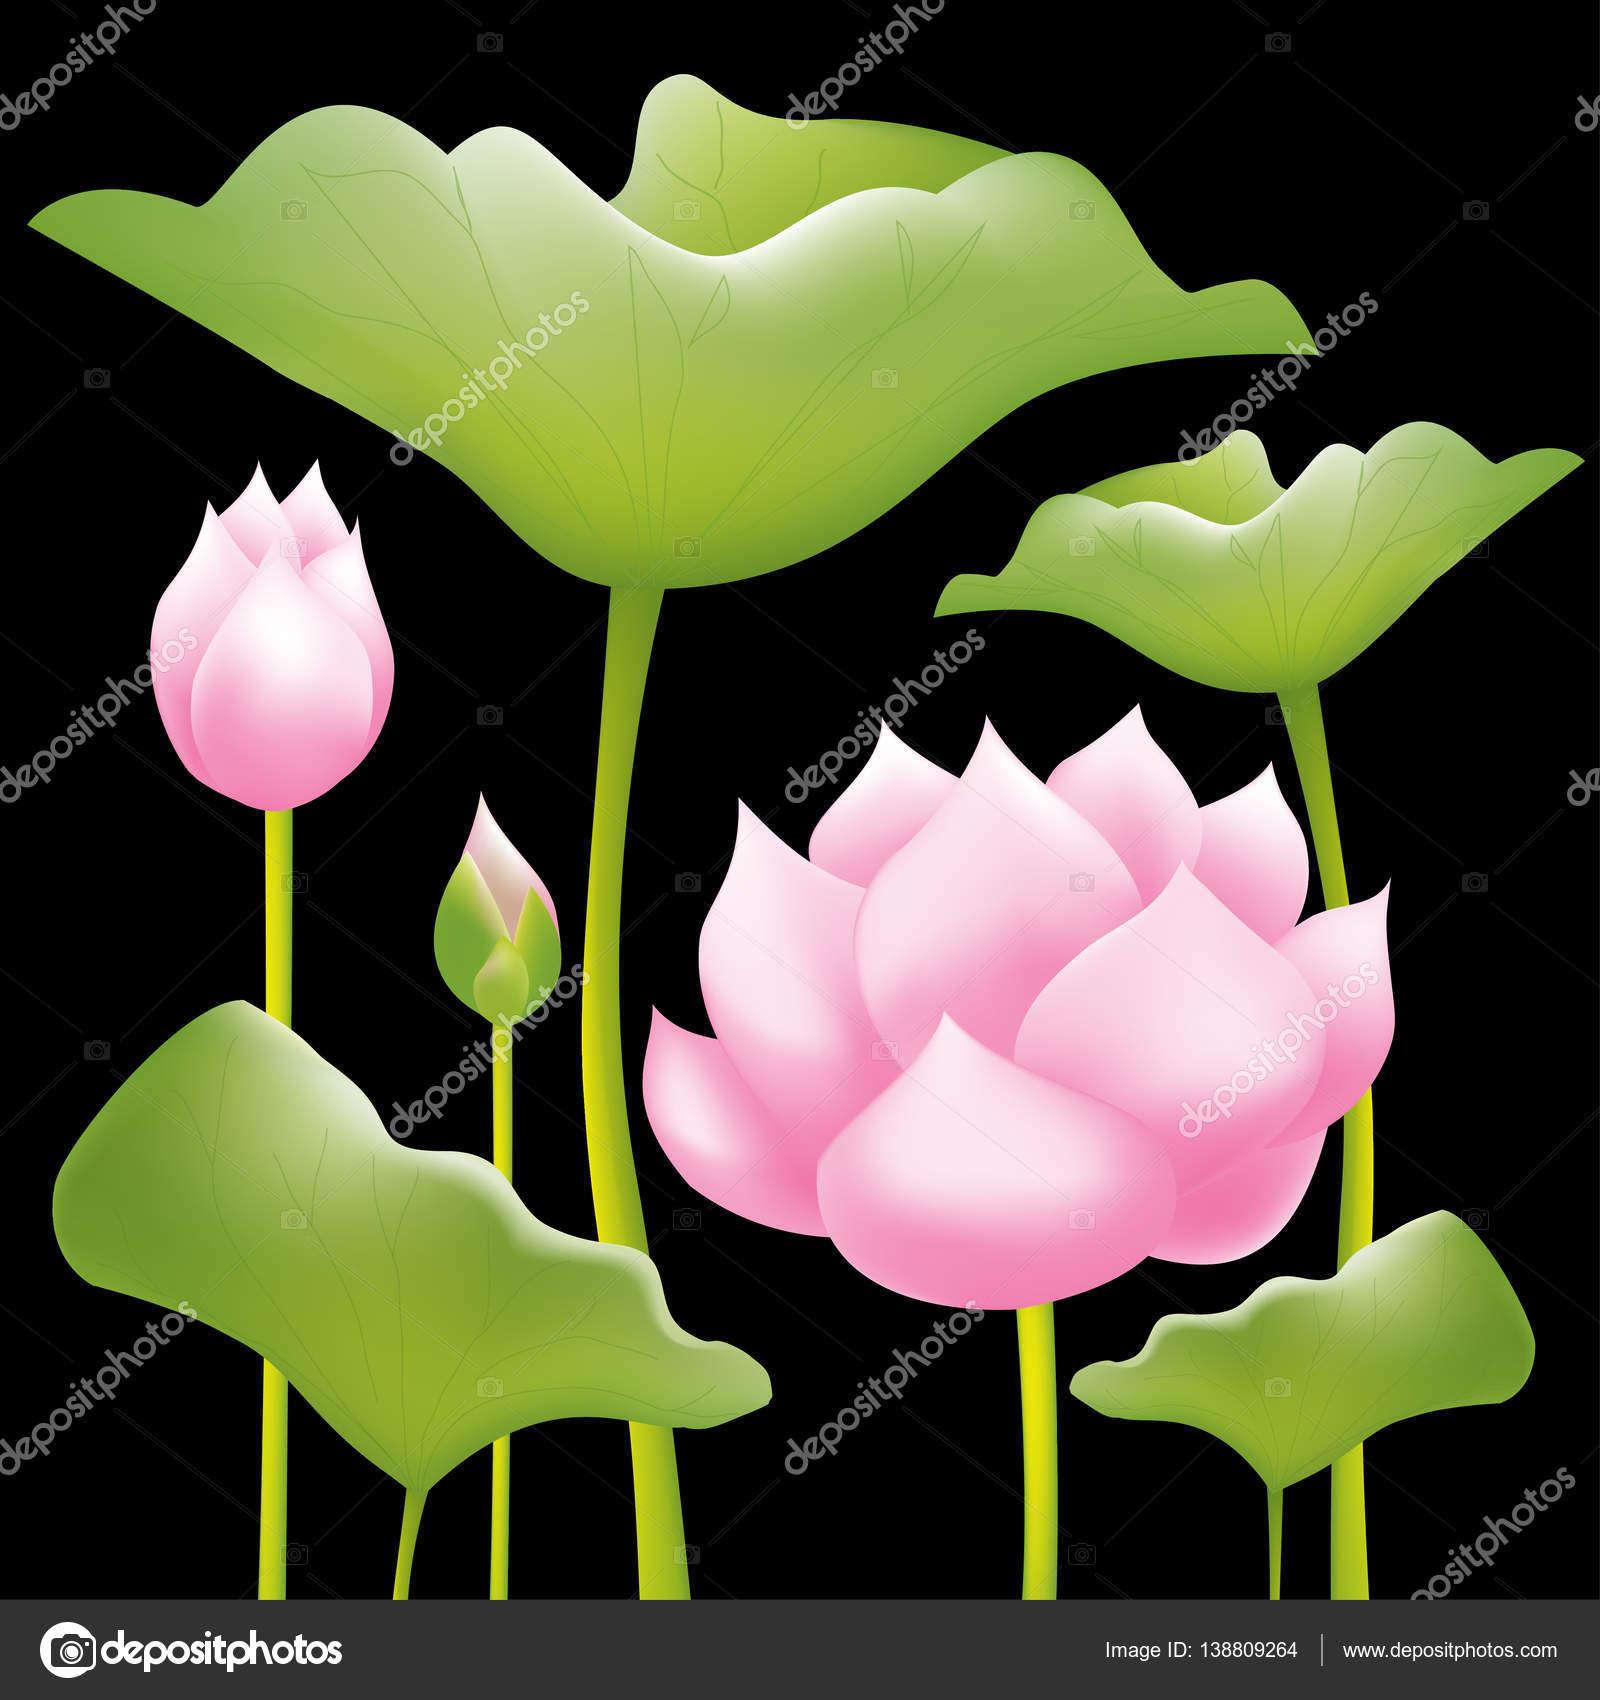 Beautiful Pink Water Lilies Or Lotus Flowers On Black Background